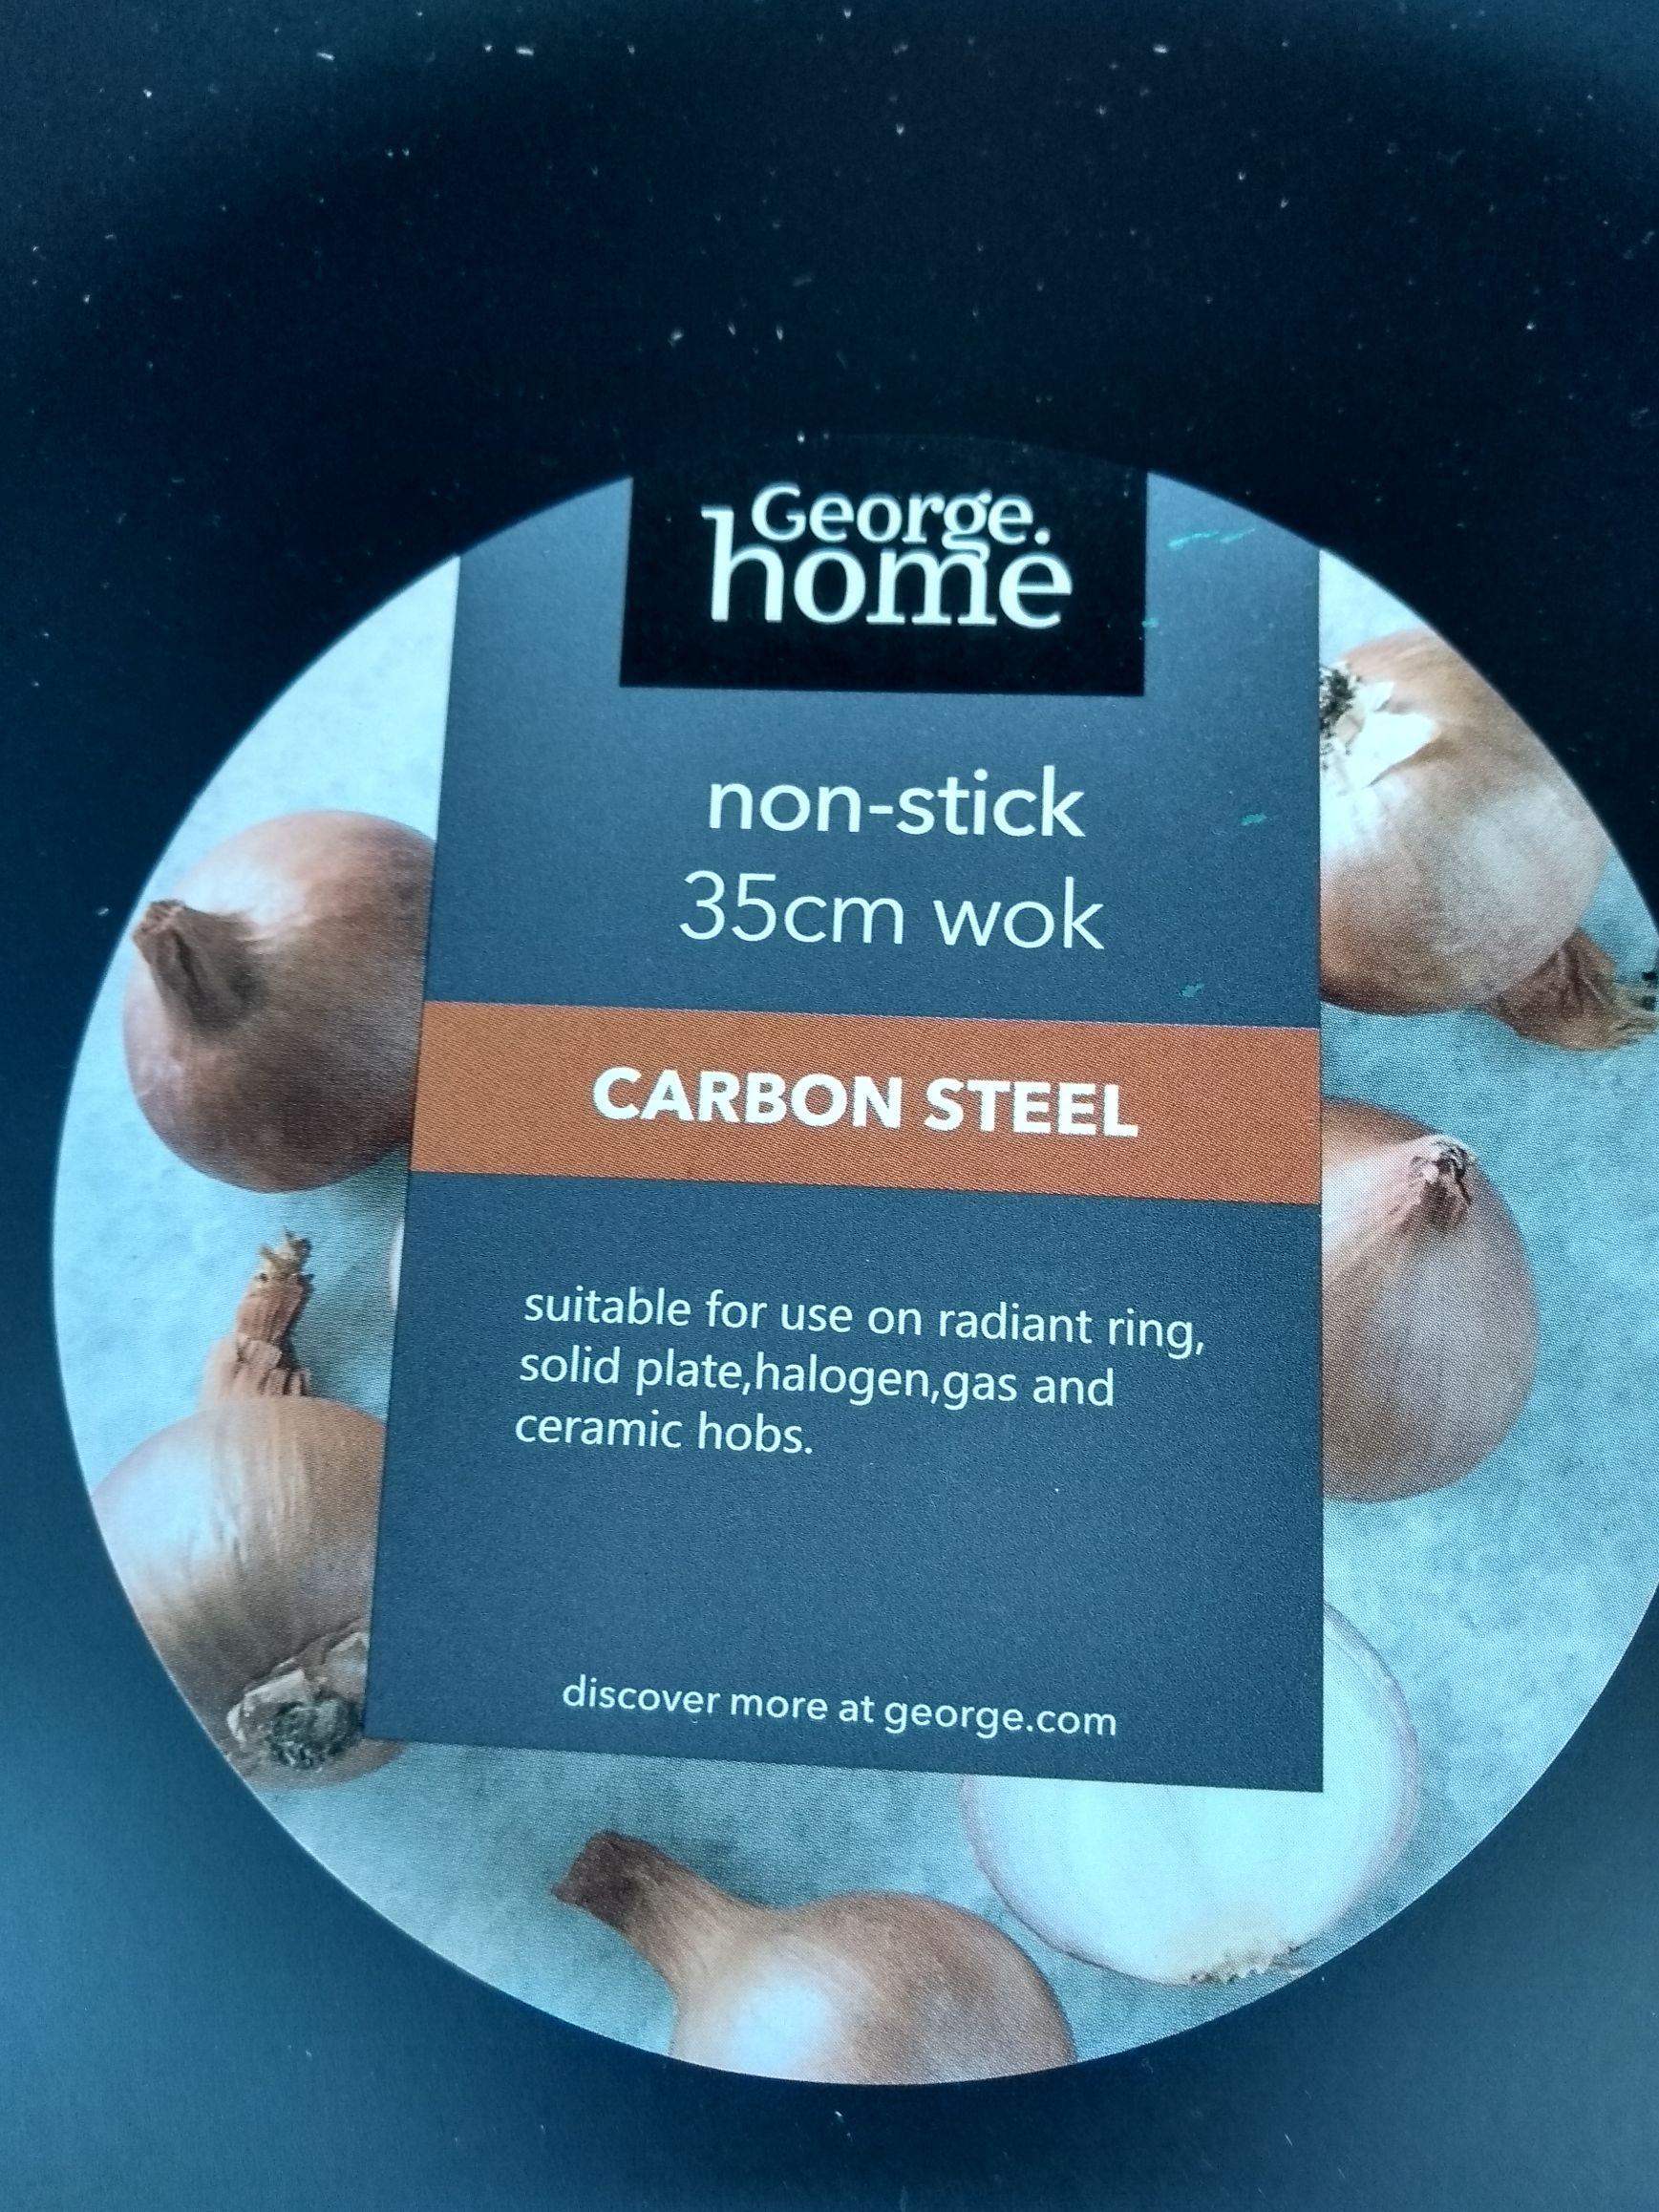 George Home Steel Wok - 35cm £1.25 at Asda North Hykeham